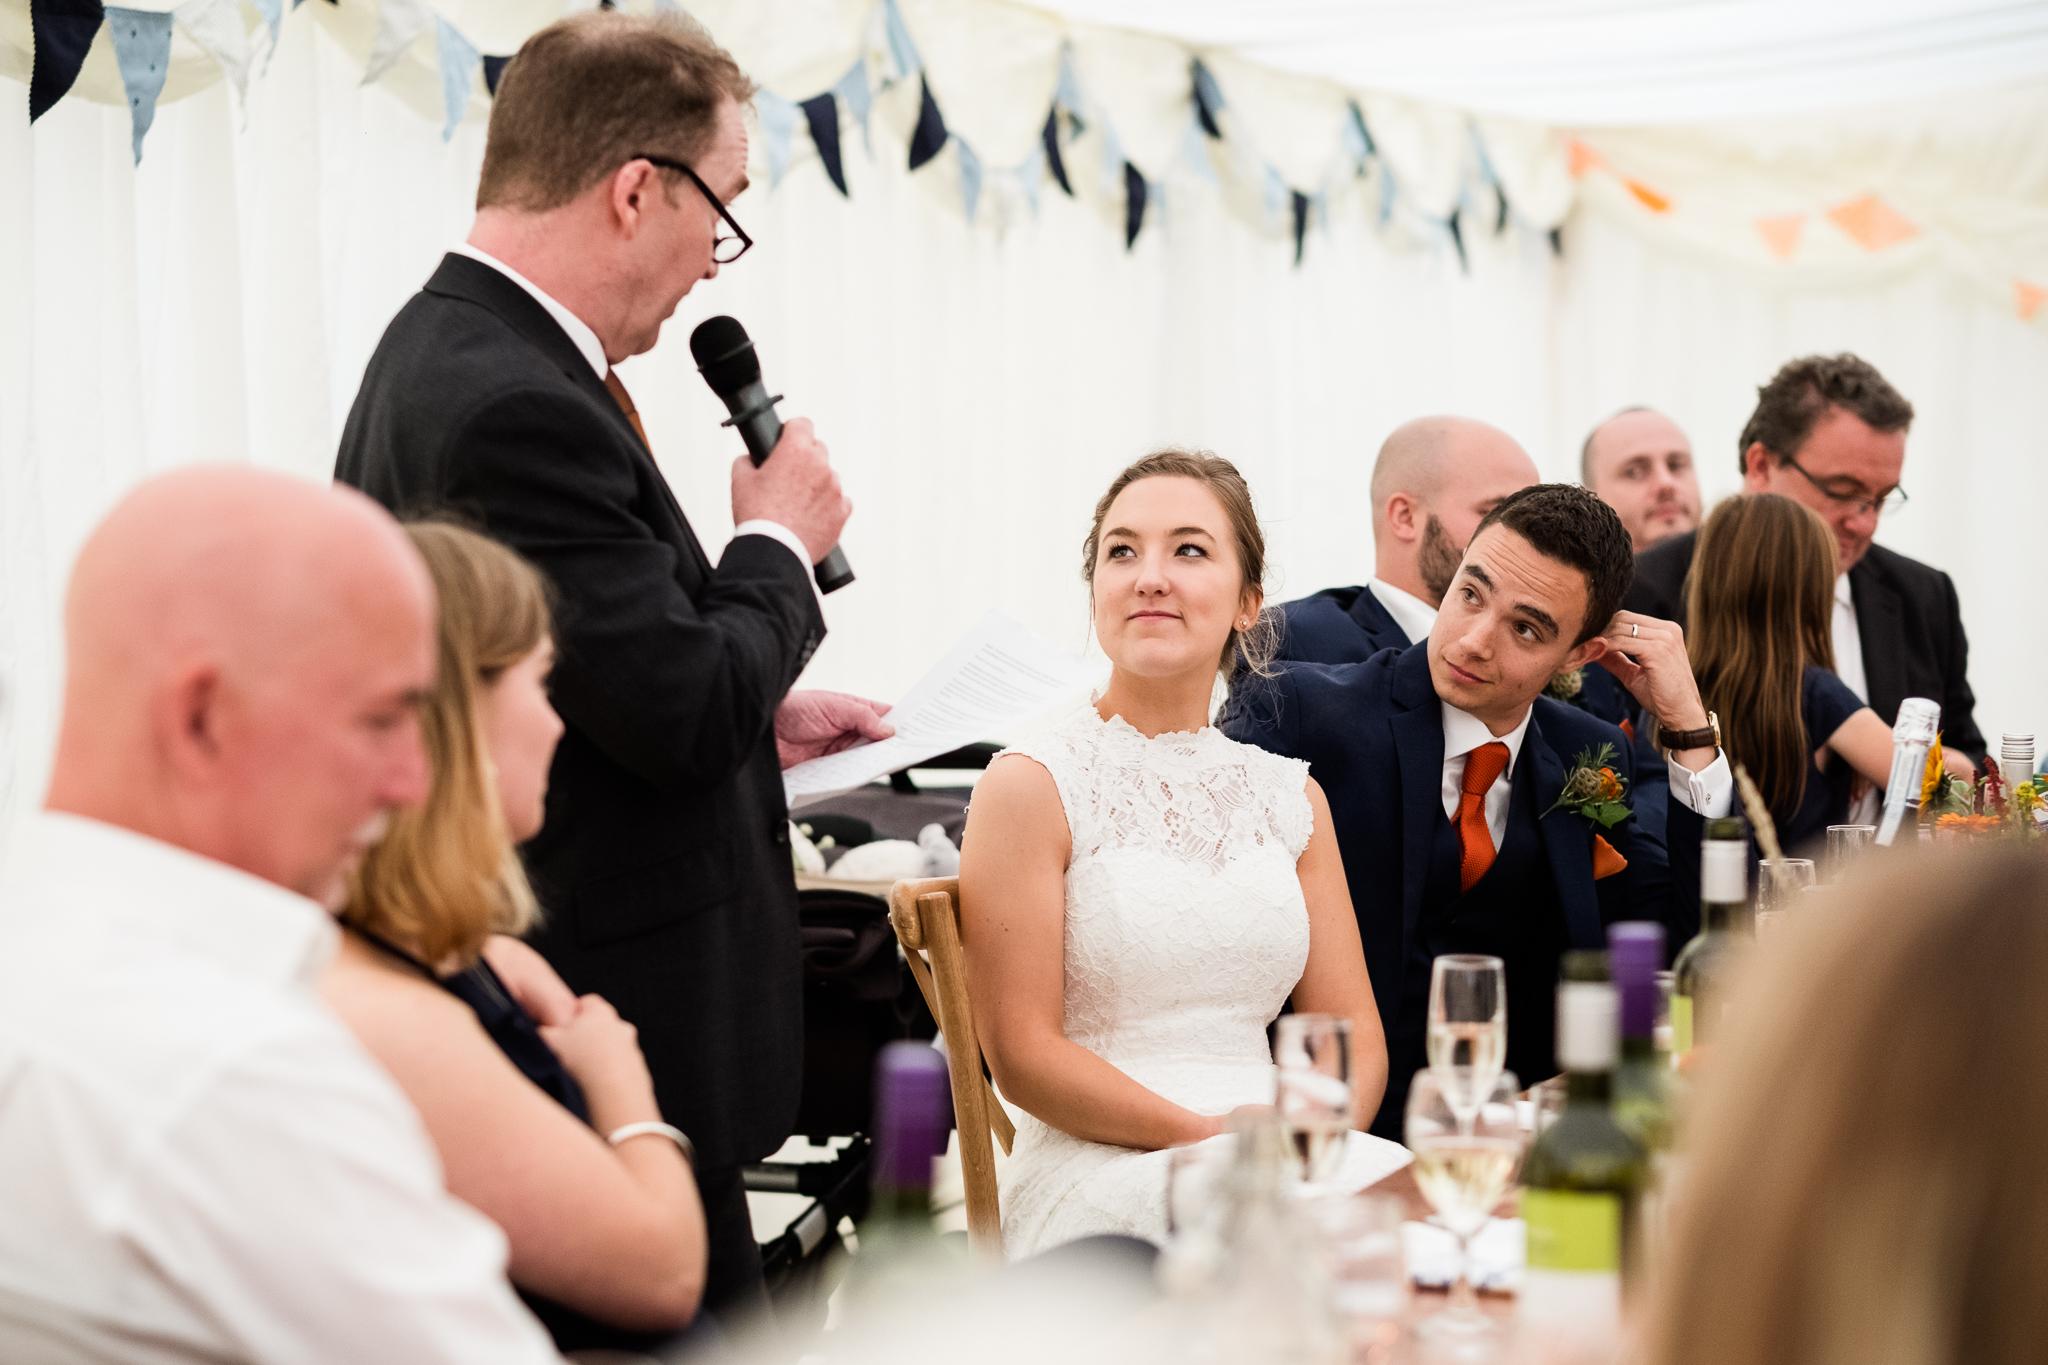 Relaxed Documentary Wedding Photography at The Wizard Inn, Alderley Edge Cheshire - Jenny Harper-67.jpg